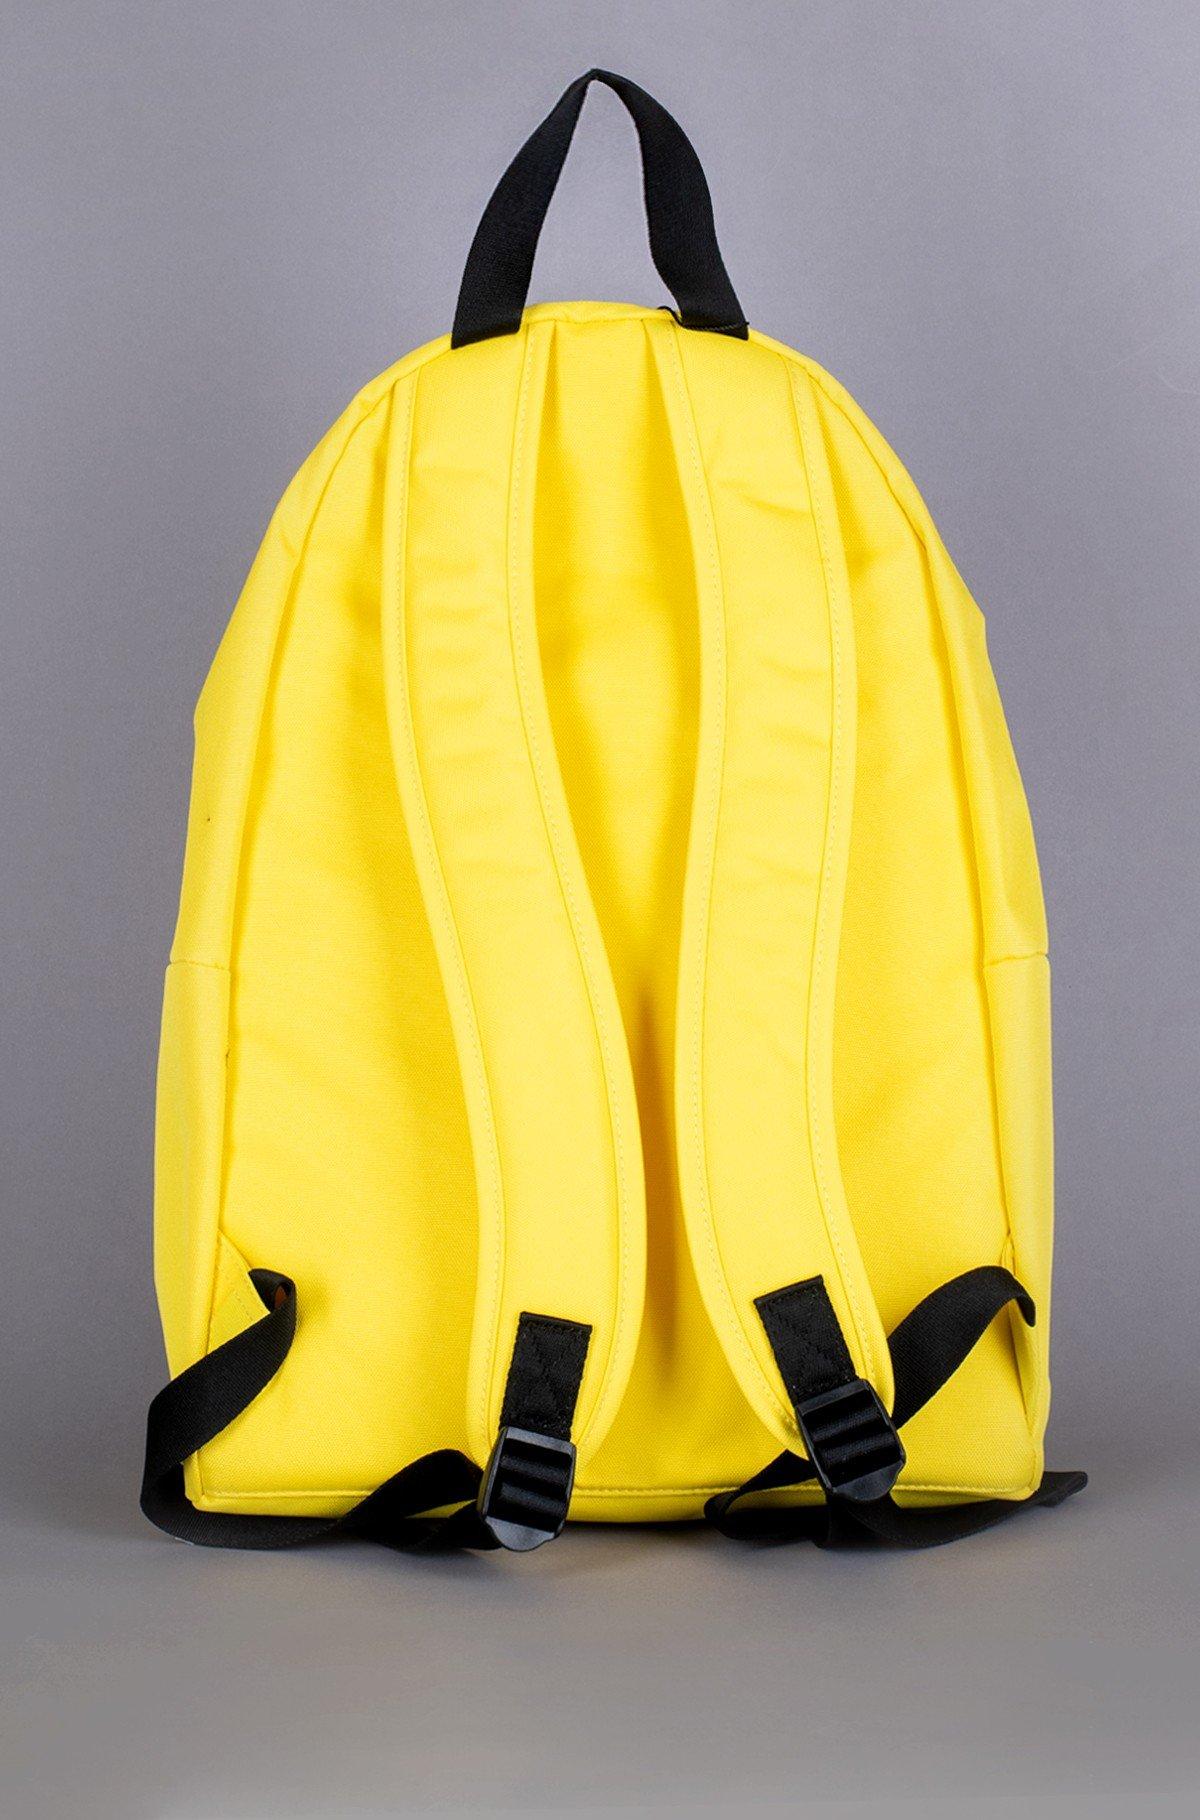 Backbag CKJ SPORT ESSENTIALS CAMPUS BP45-full-2